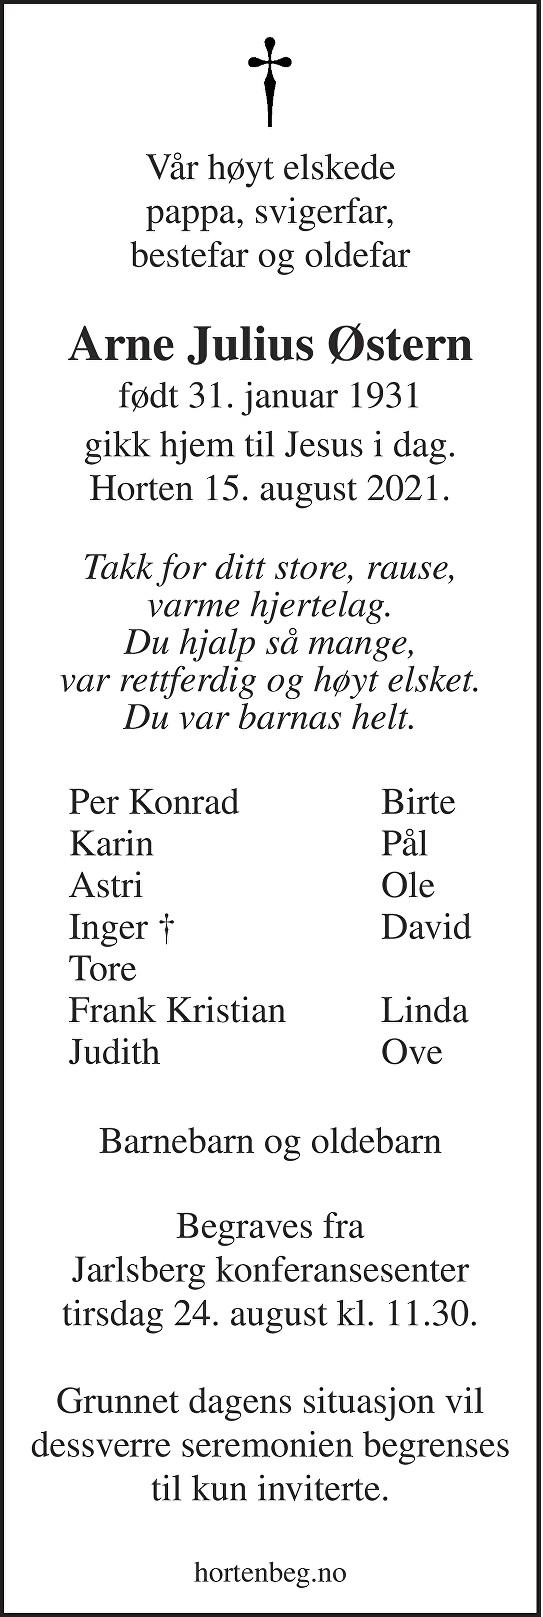 Arne Julius Østern Dødsannonse